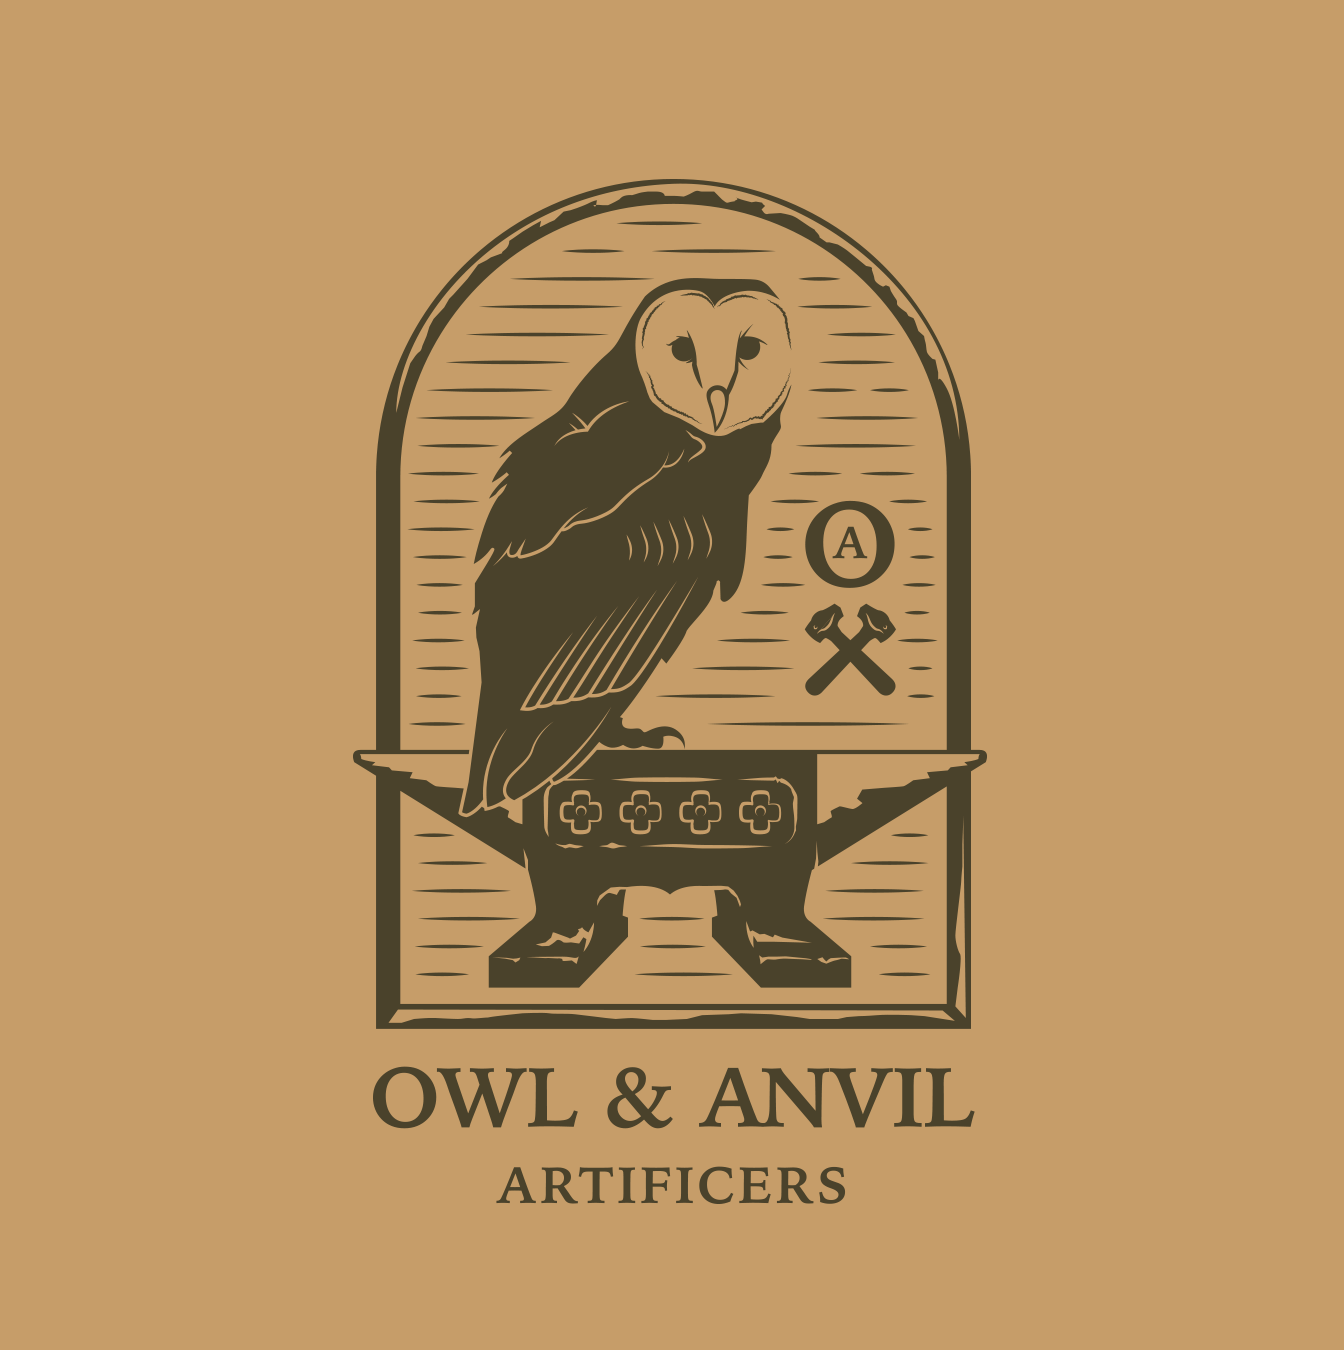 Owl & Anvil